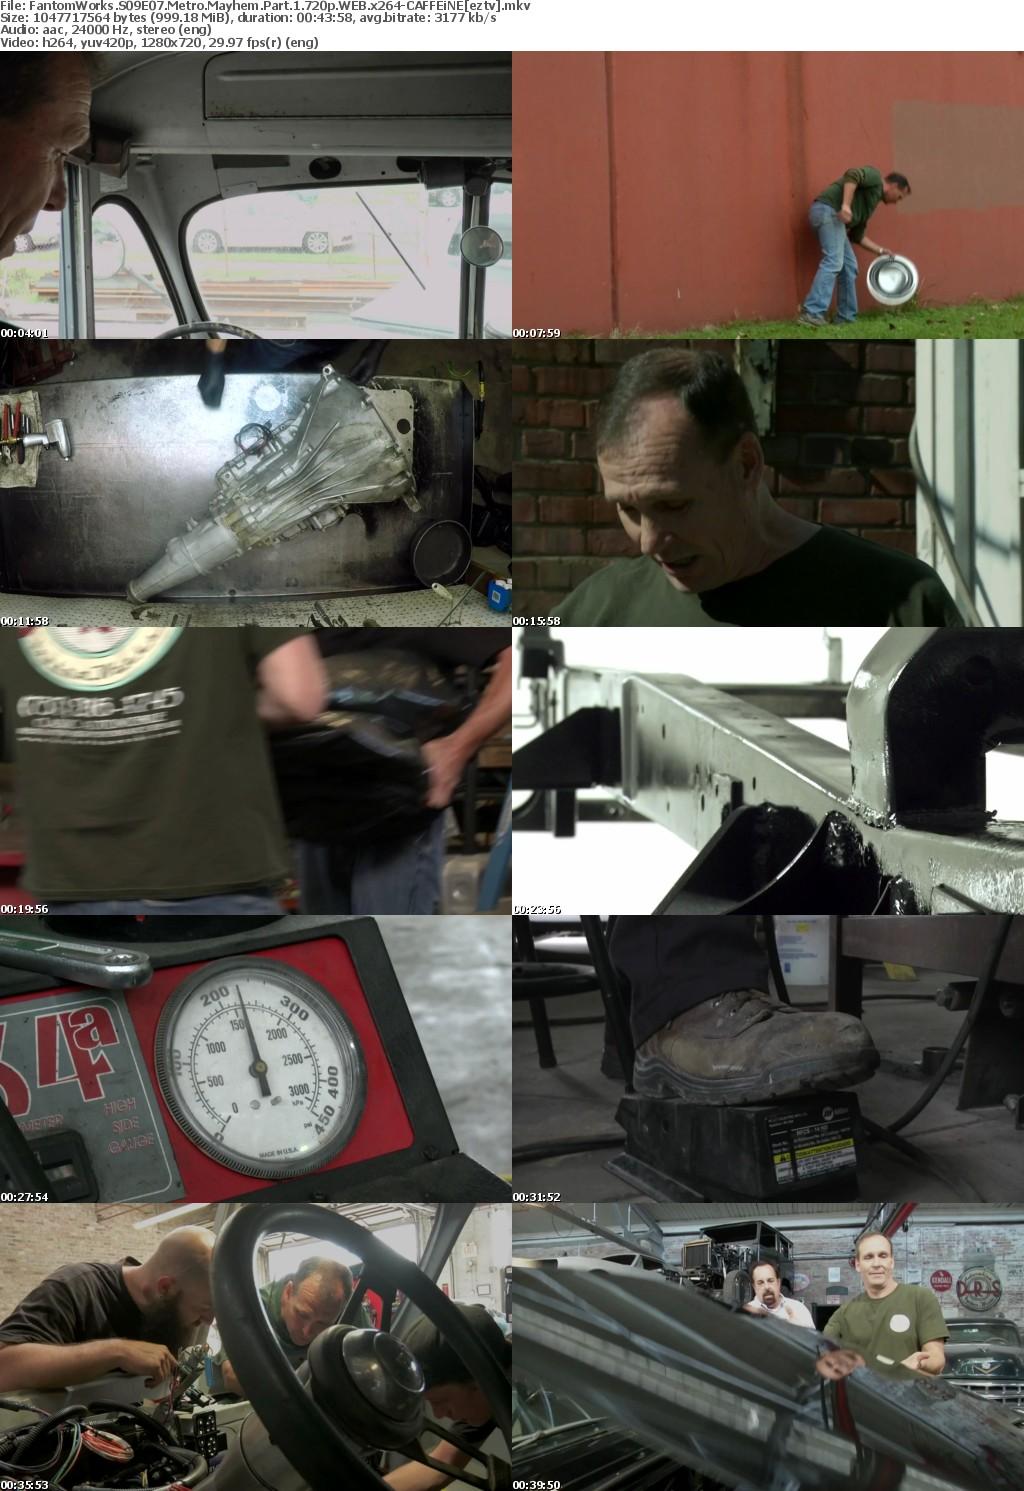 FantomWorks S09E07 Metro Mayhem Part 1 720p WEB x264-CAFFEiNE